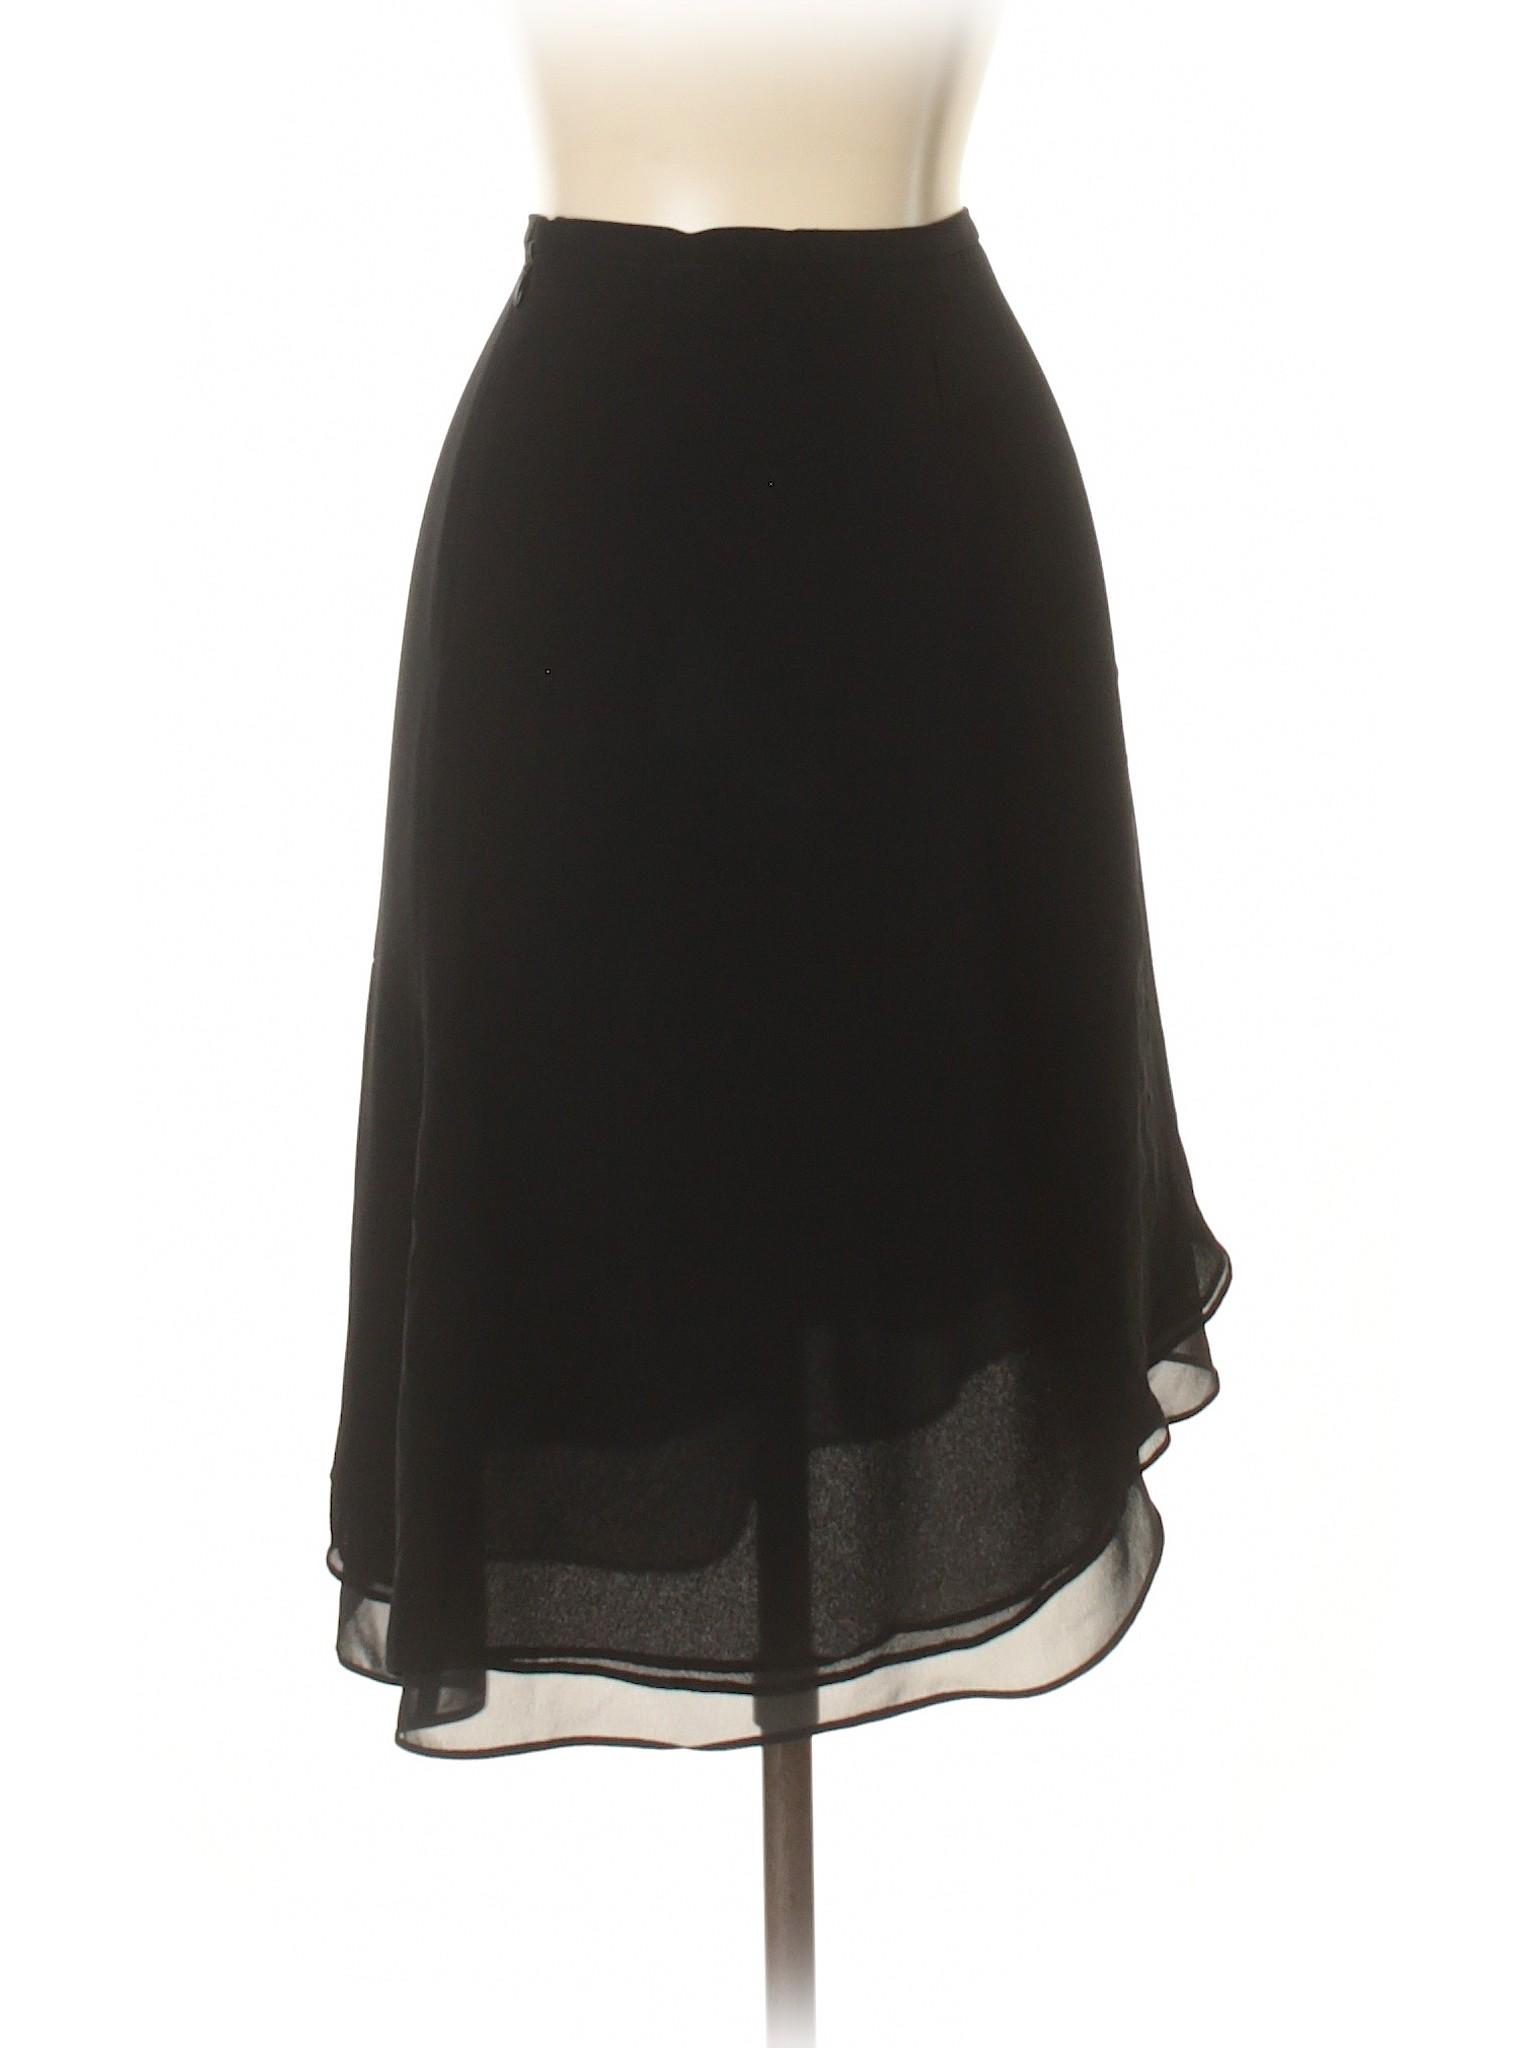 Boutique Skirt Boutique Silk Silk Silk Skirt Silk Skirt Boutique Boutique rPYrwATdq